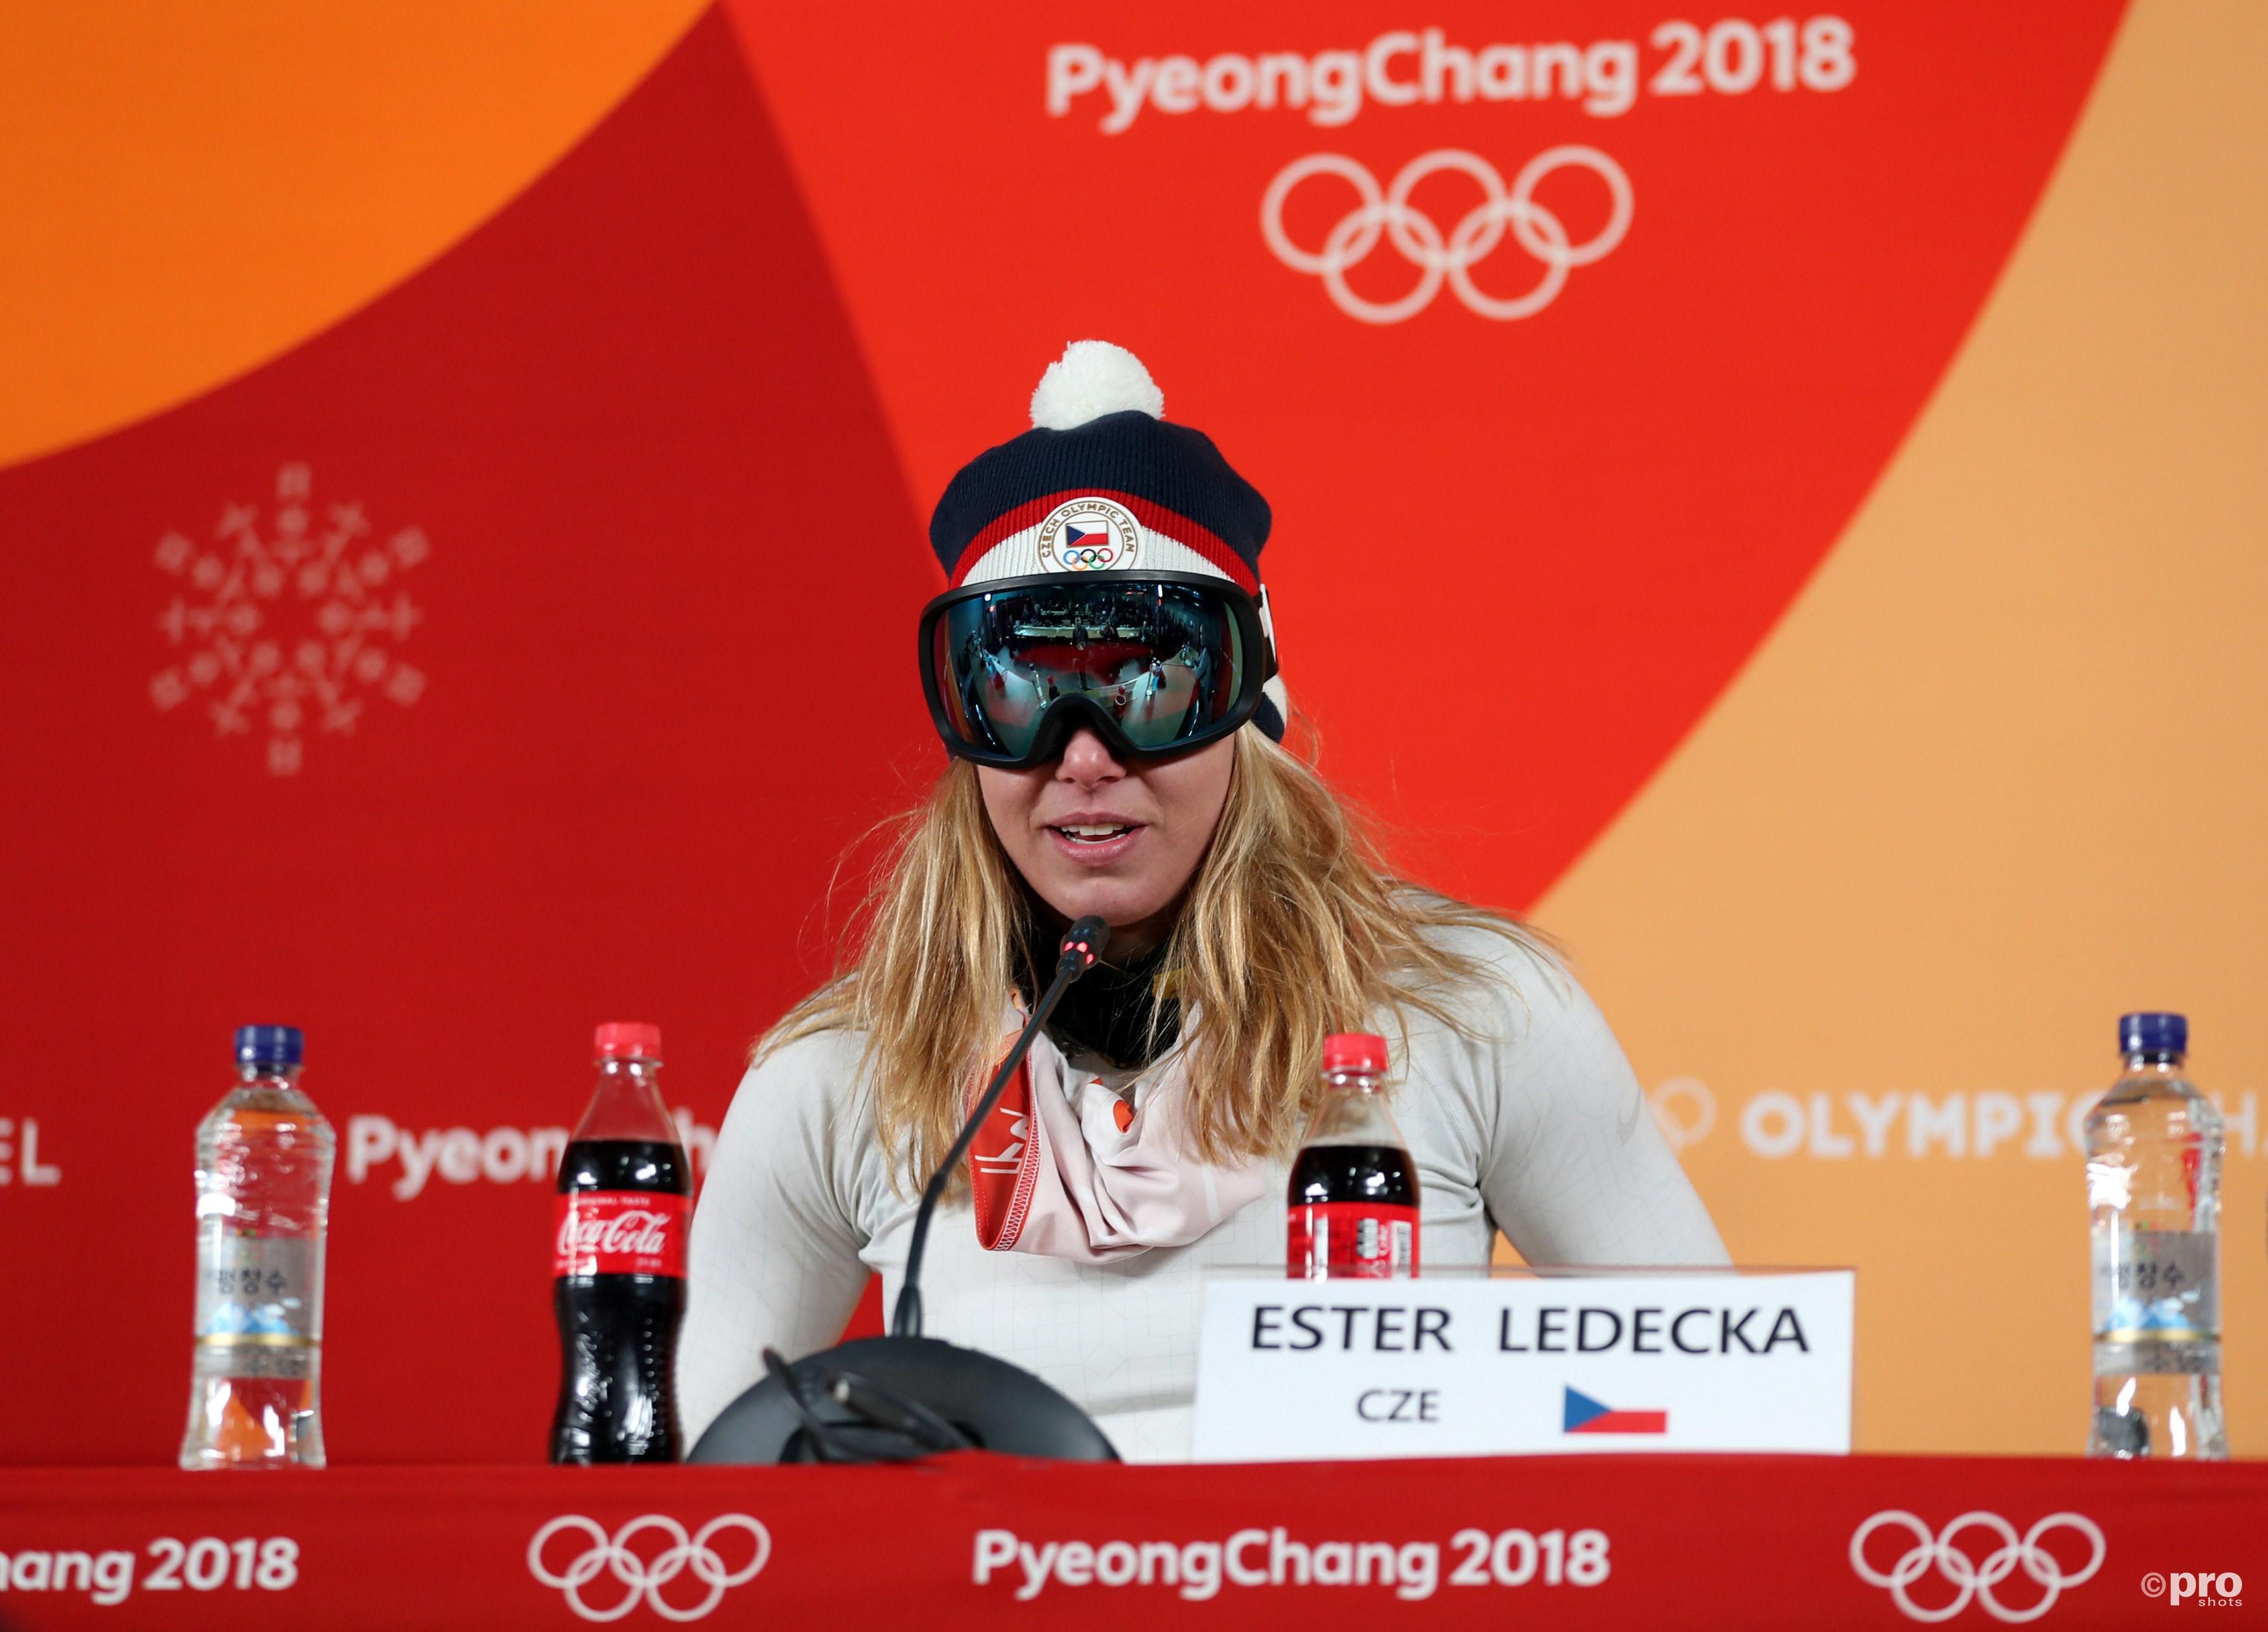 Ledecka met bril en al tijdens de persconferentie (Pro Shots/Action Images)